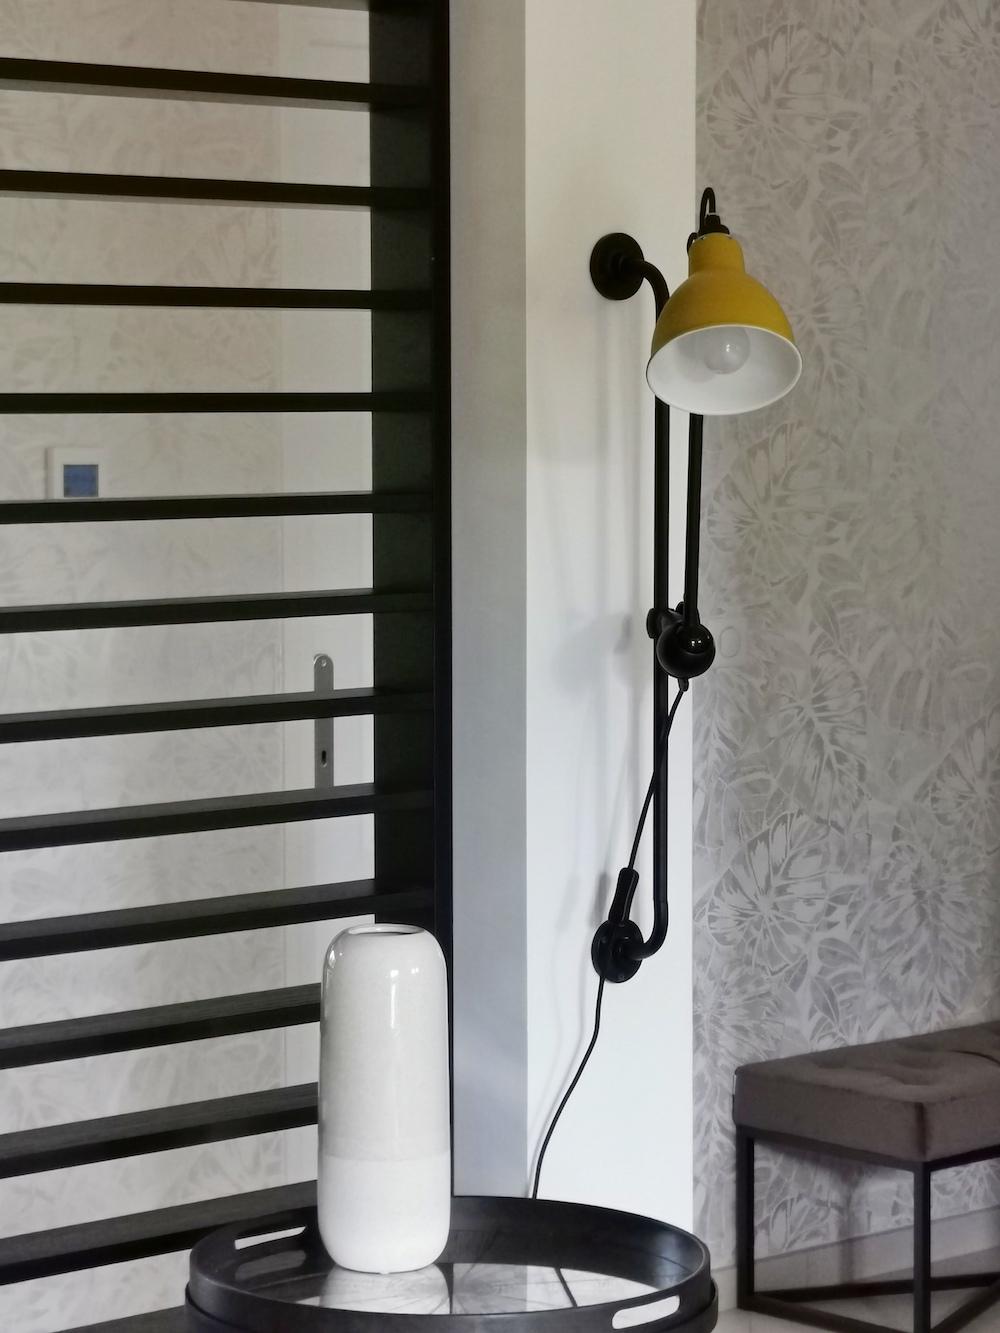 Renovation-maison-salon-serris-77-small-3